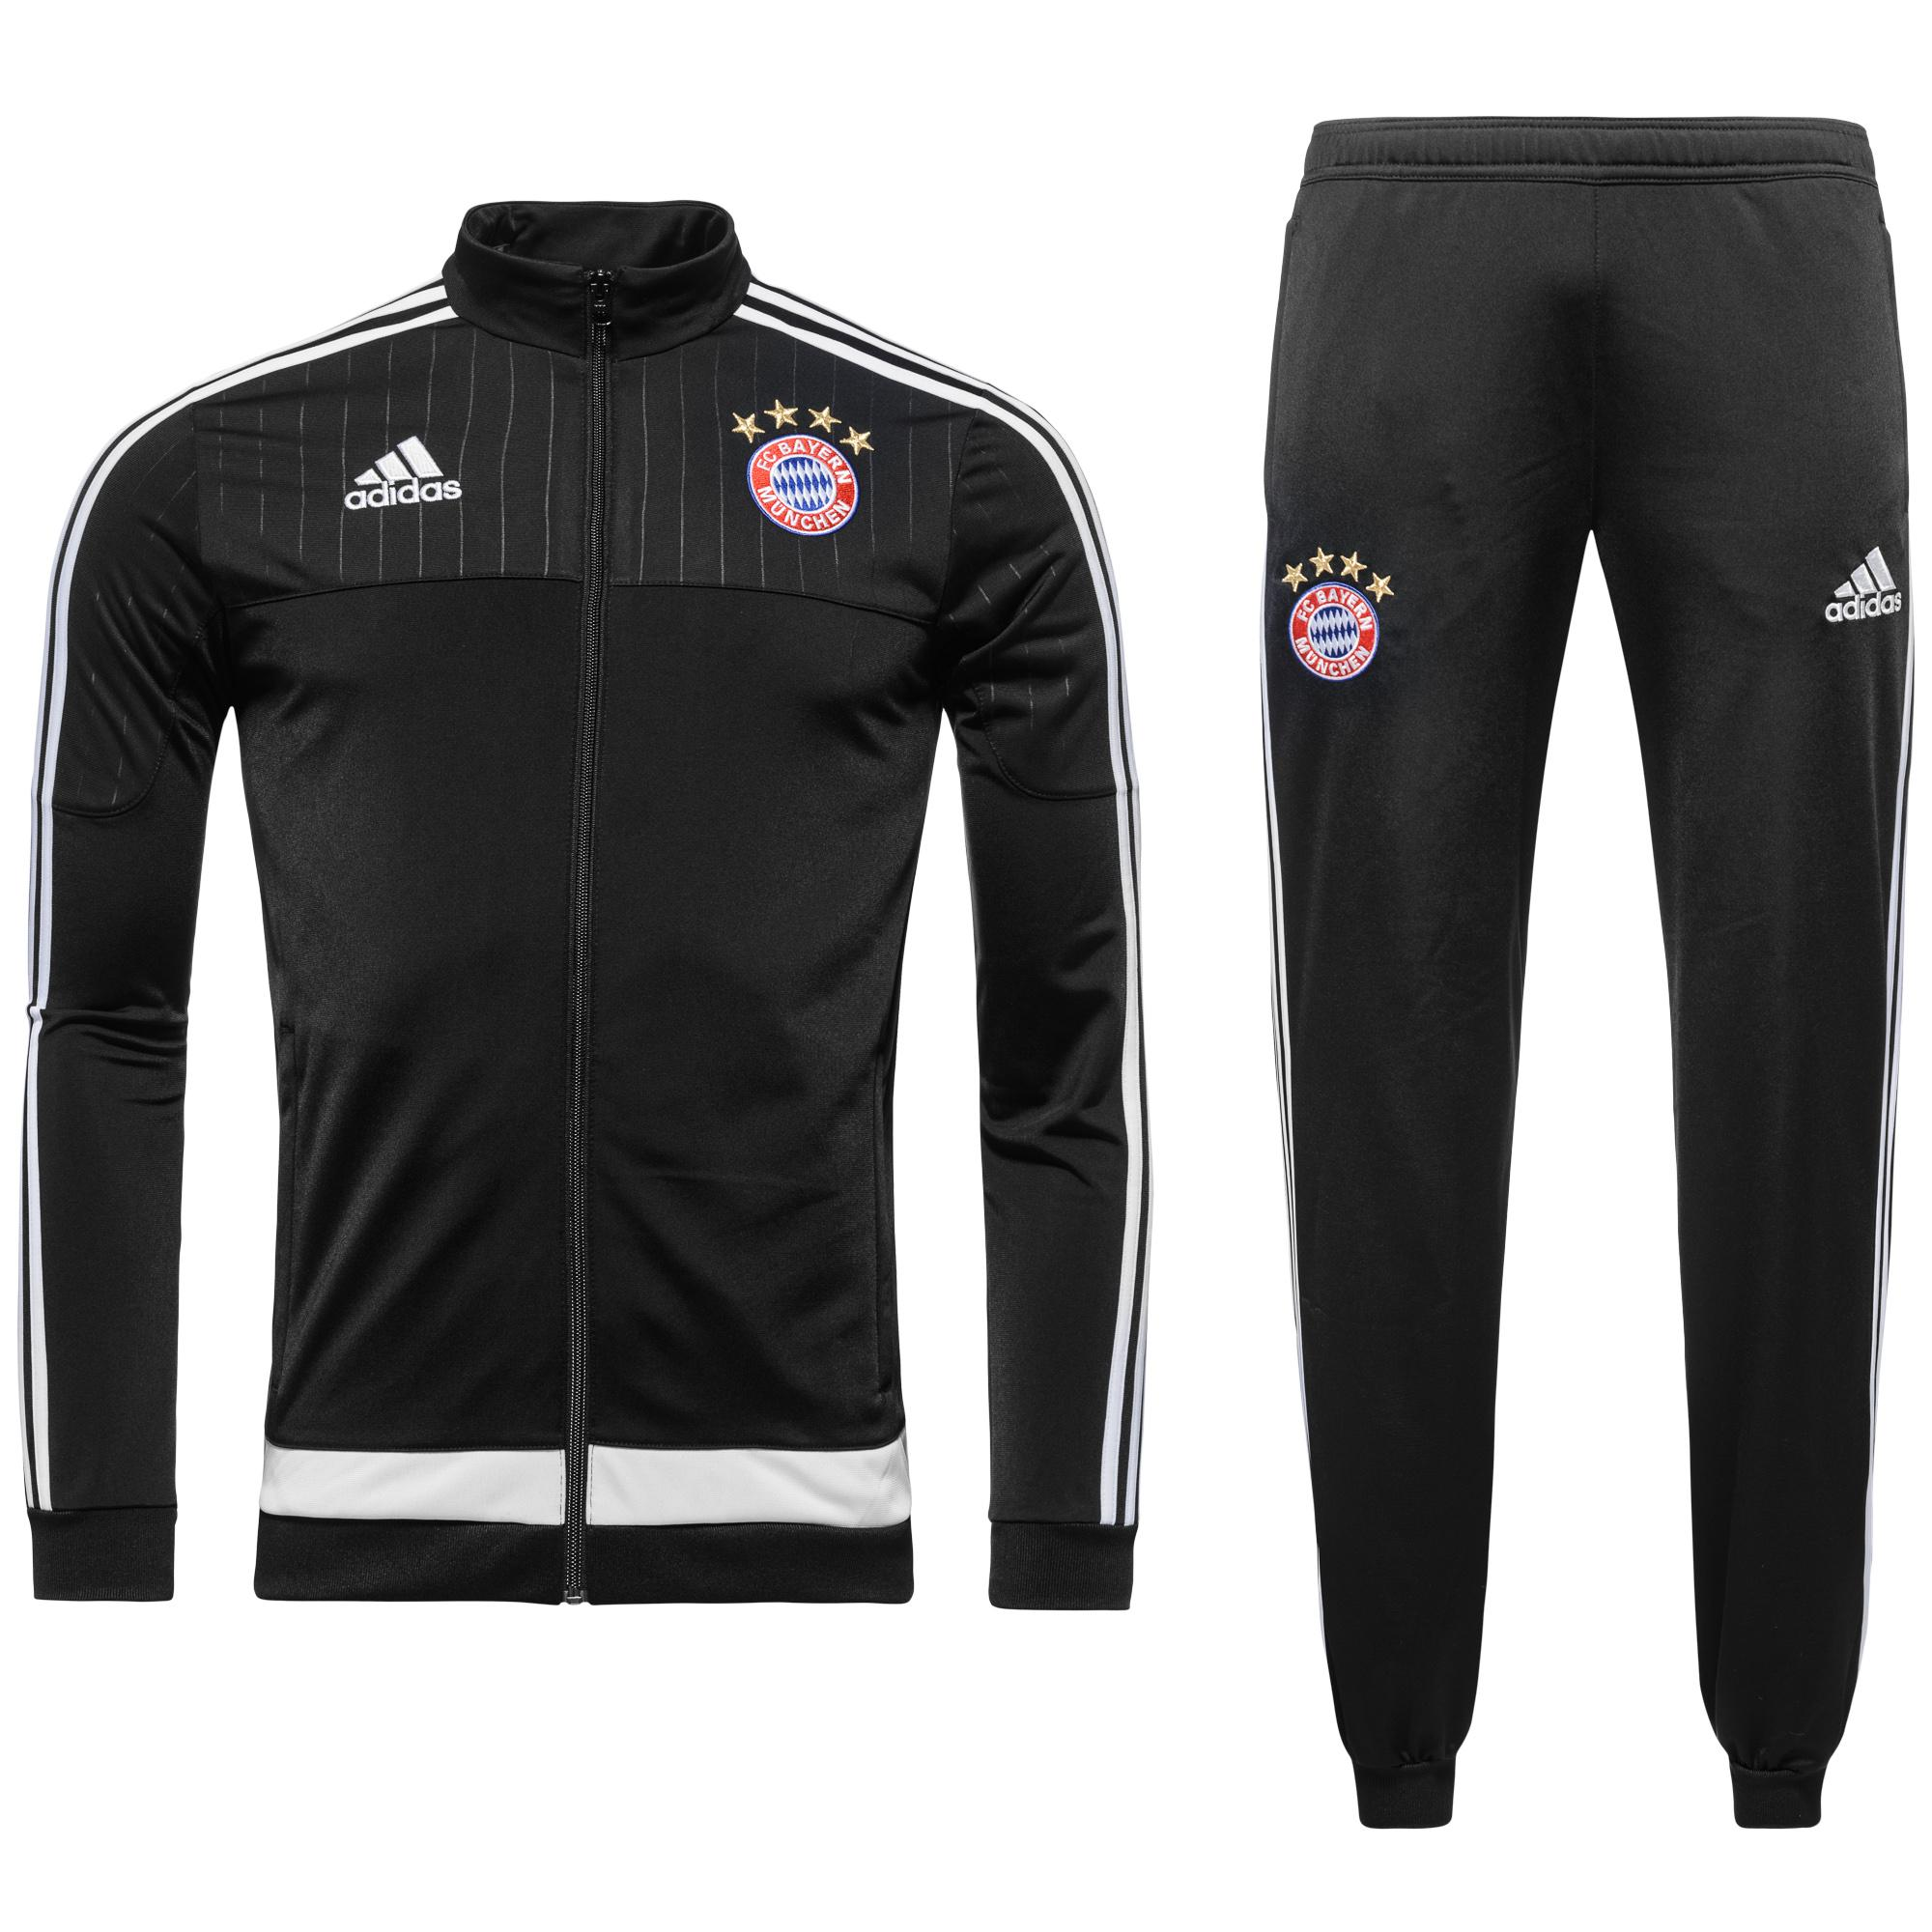 Bayern München Träningsställ Svart/Vit Barn